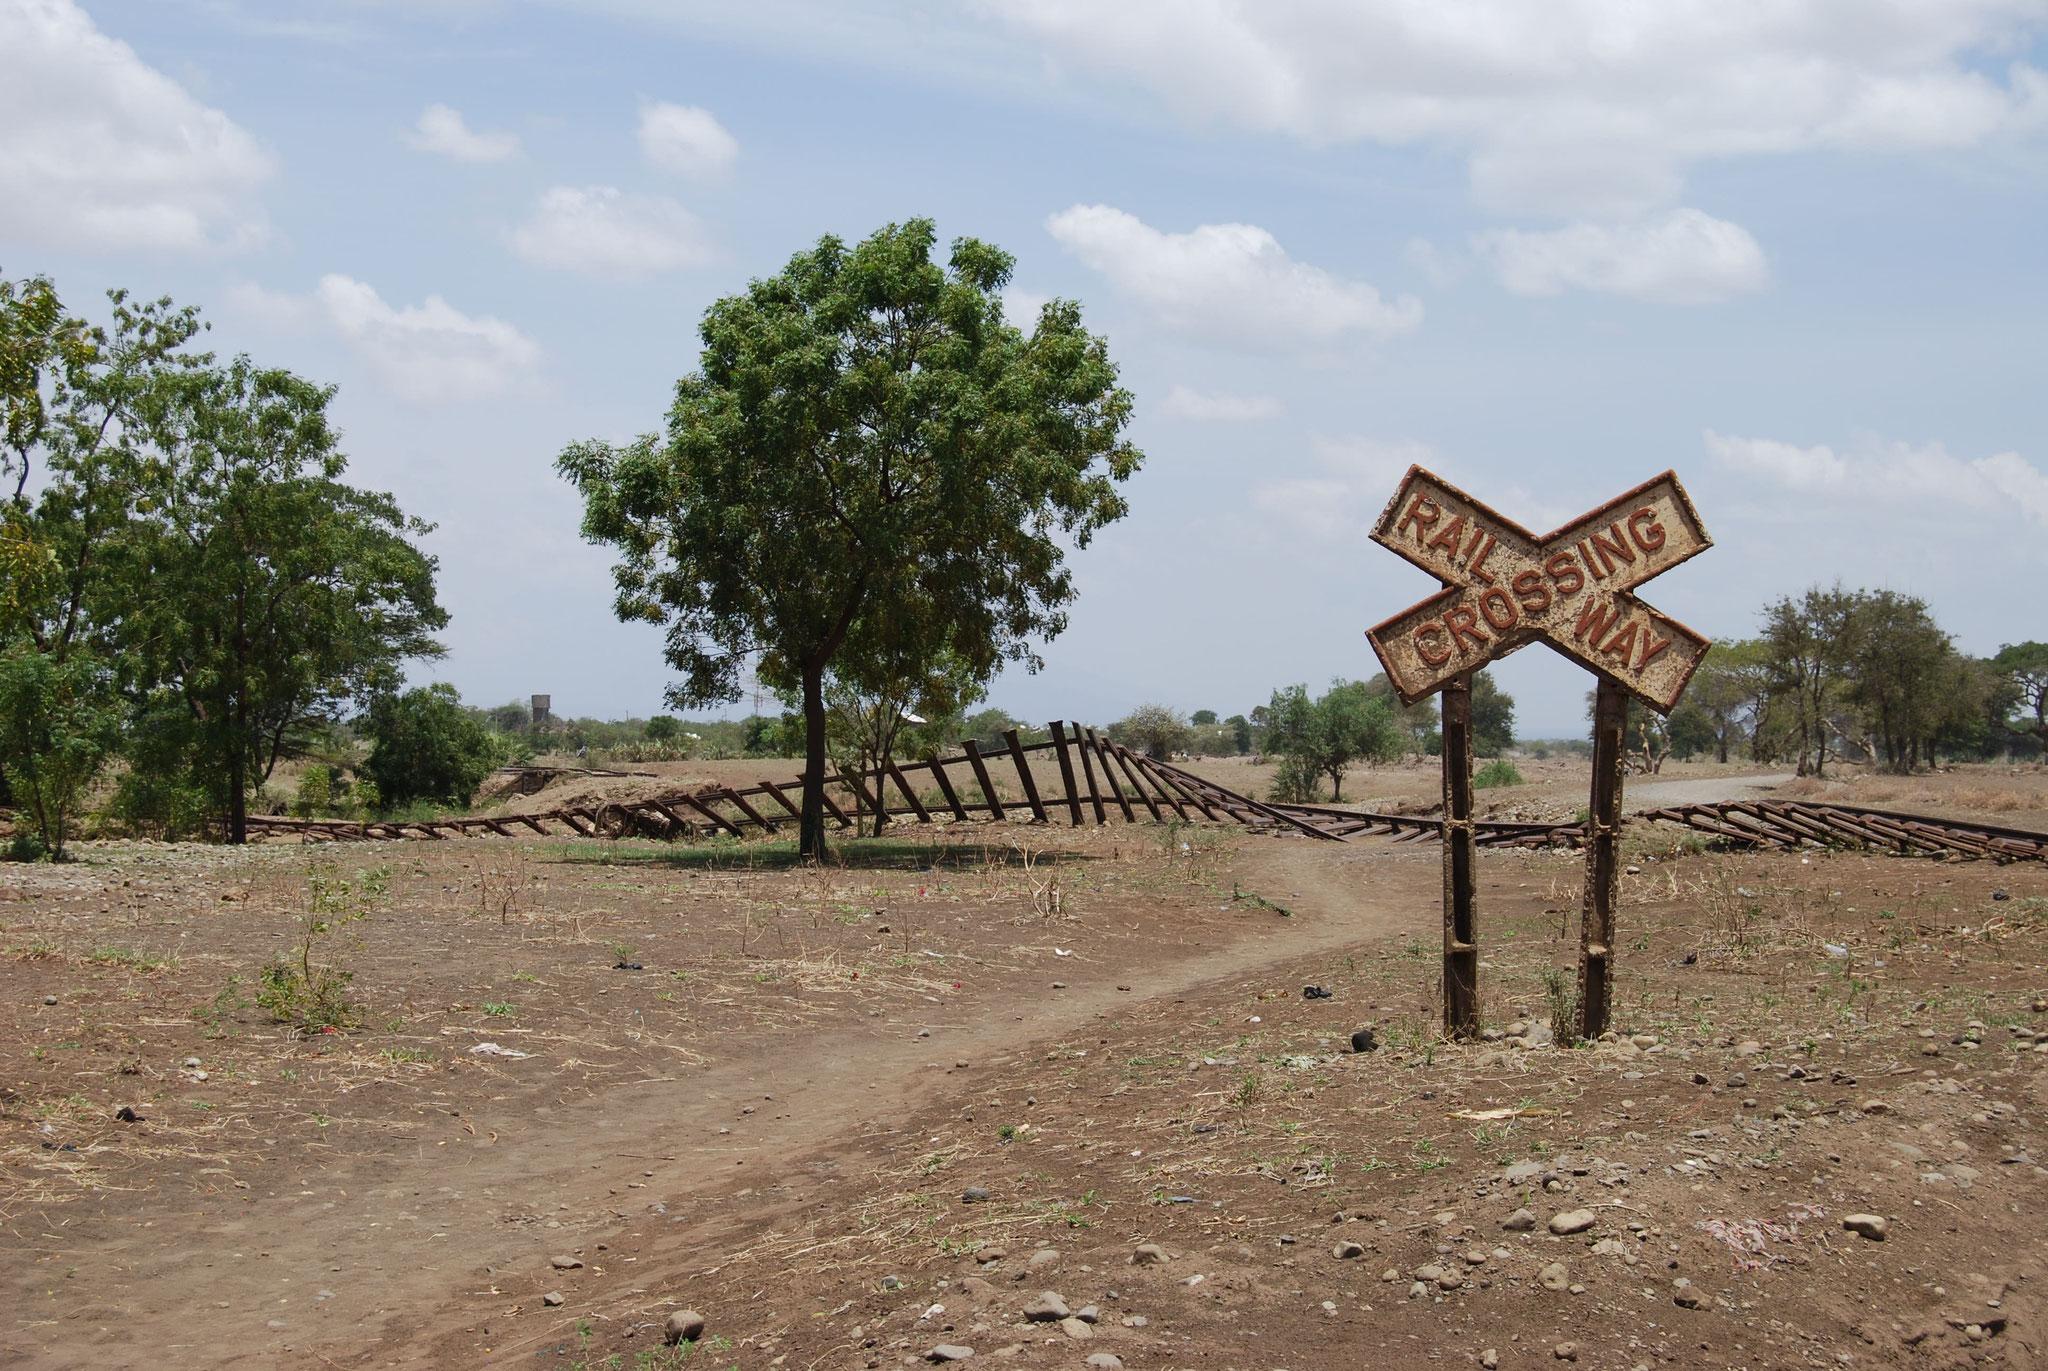 Christian dating site Tansaniassa